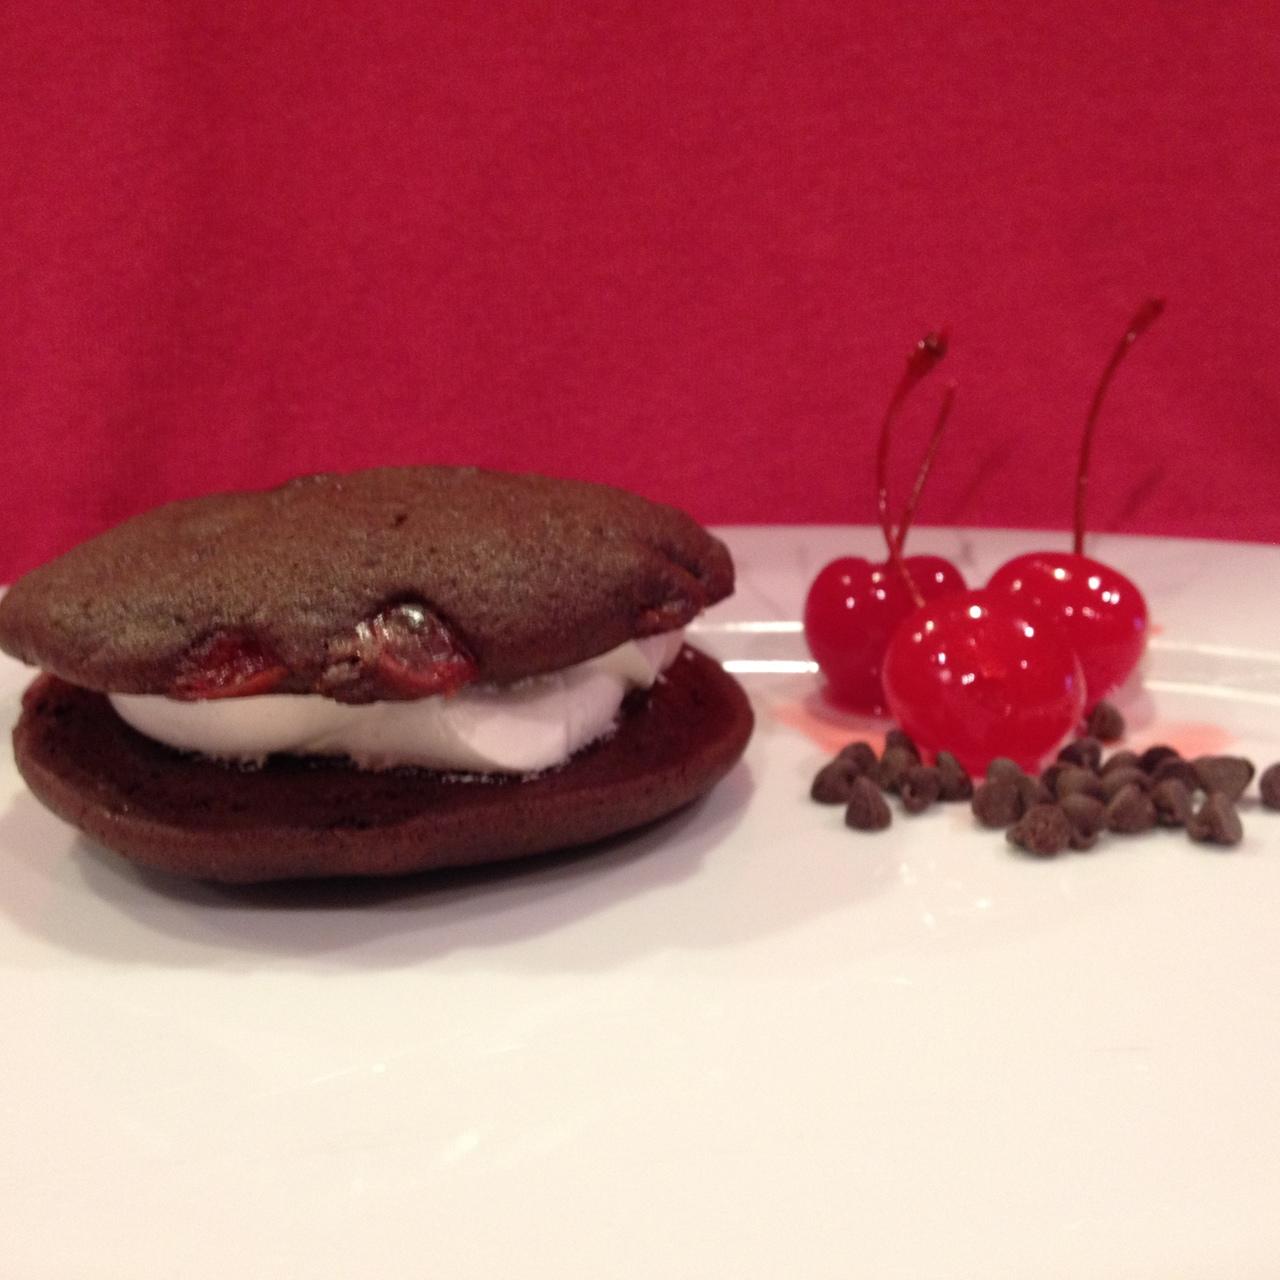 12 Pack- Medium Chocolate Cherry Whoopie Pies (Birthday Party Size)